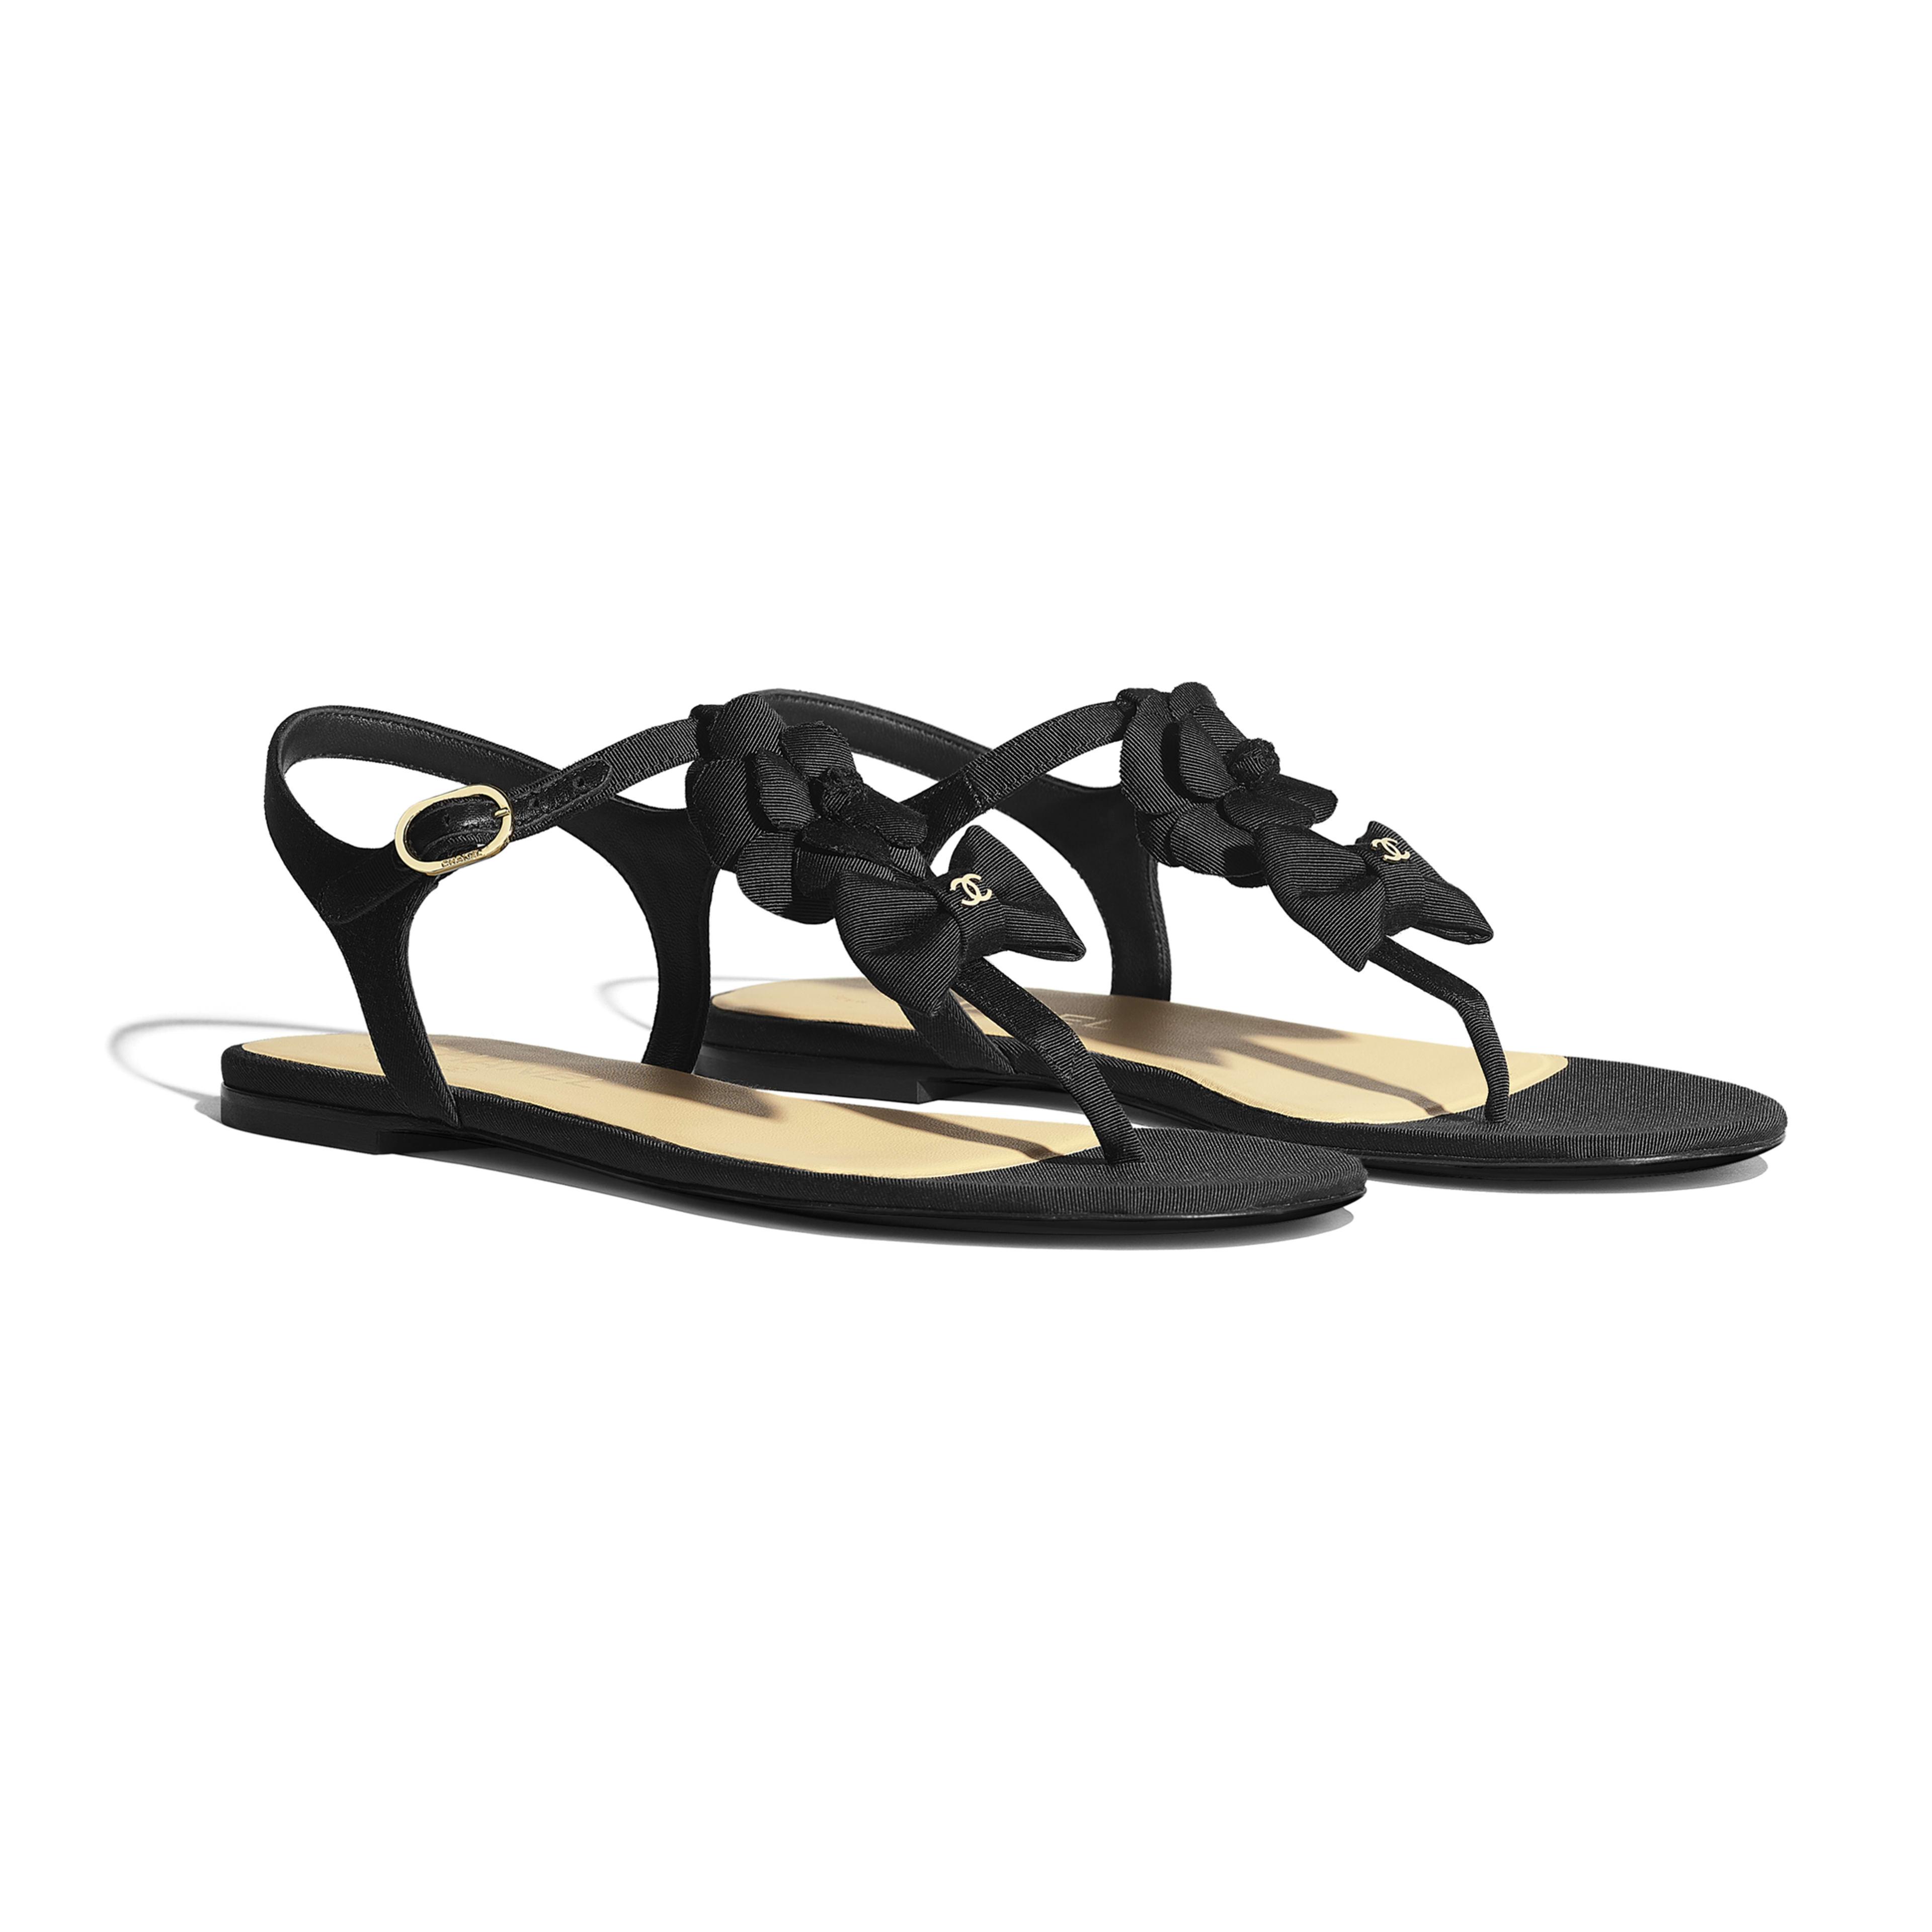 Sandals - Black - Grosgrain - Alternative view - see full sized version